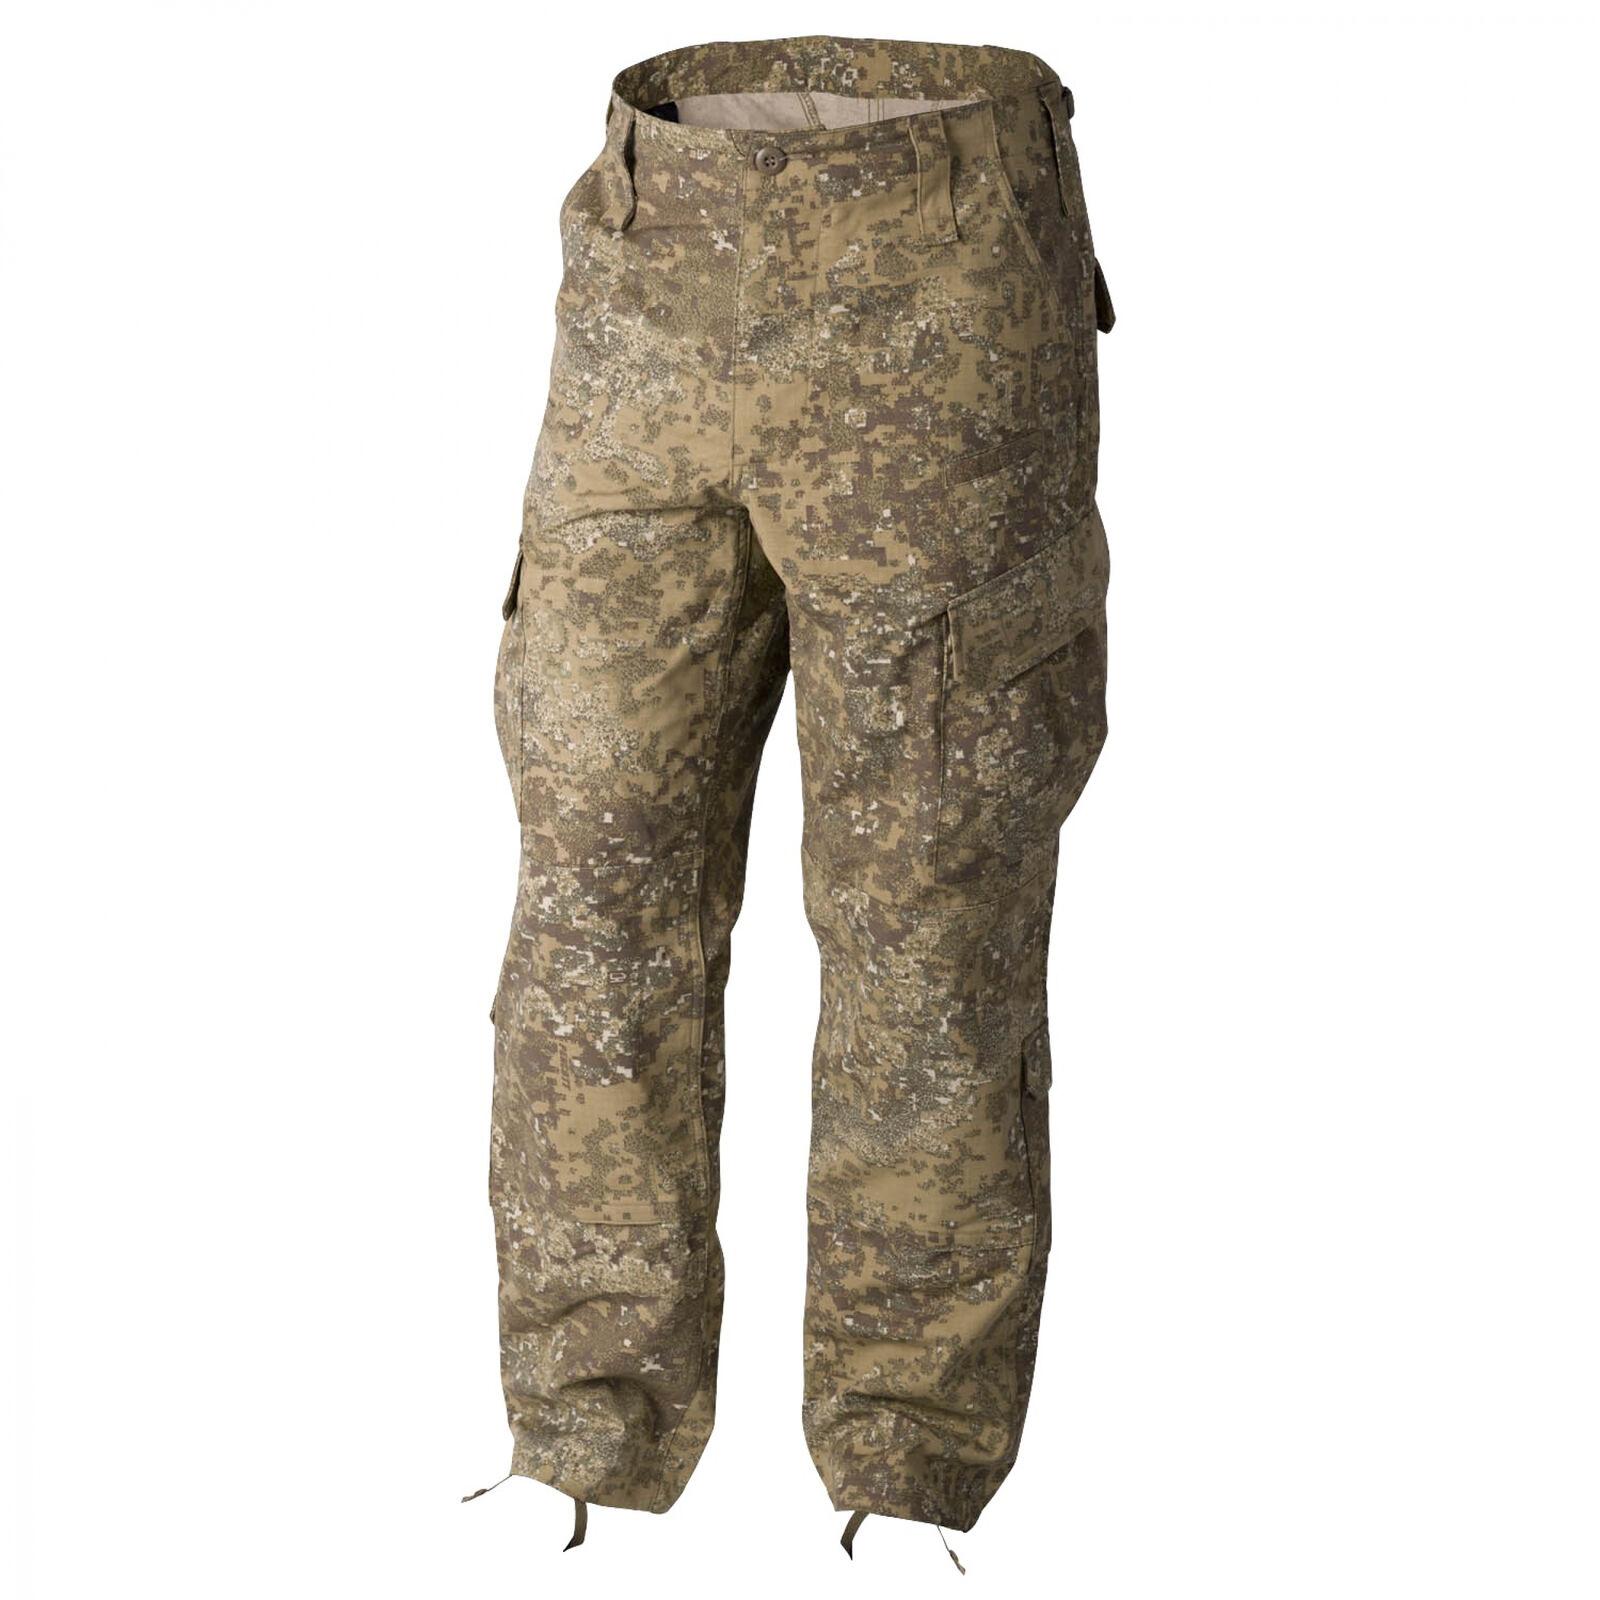 Helikon-Tex Combat Patrol Uniform Trousers Hose  -NyCo- PenCott Badlands